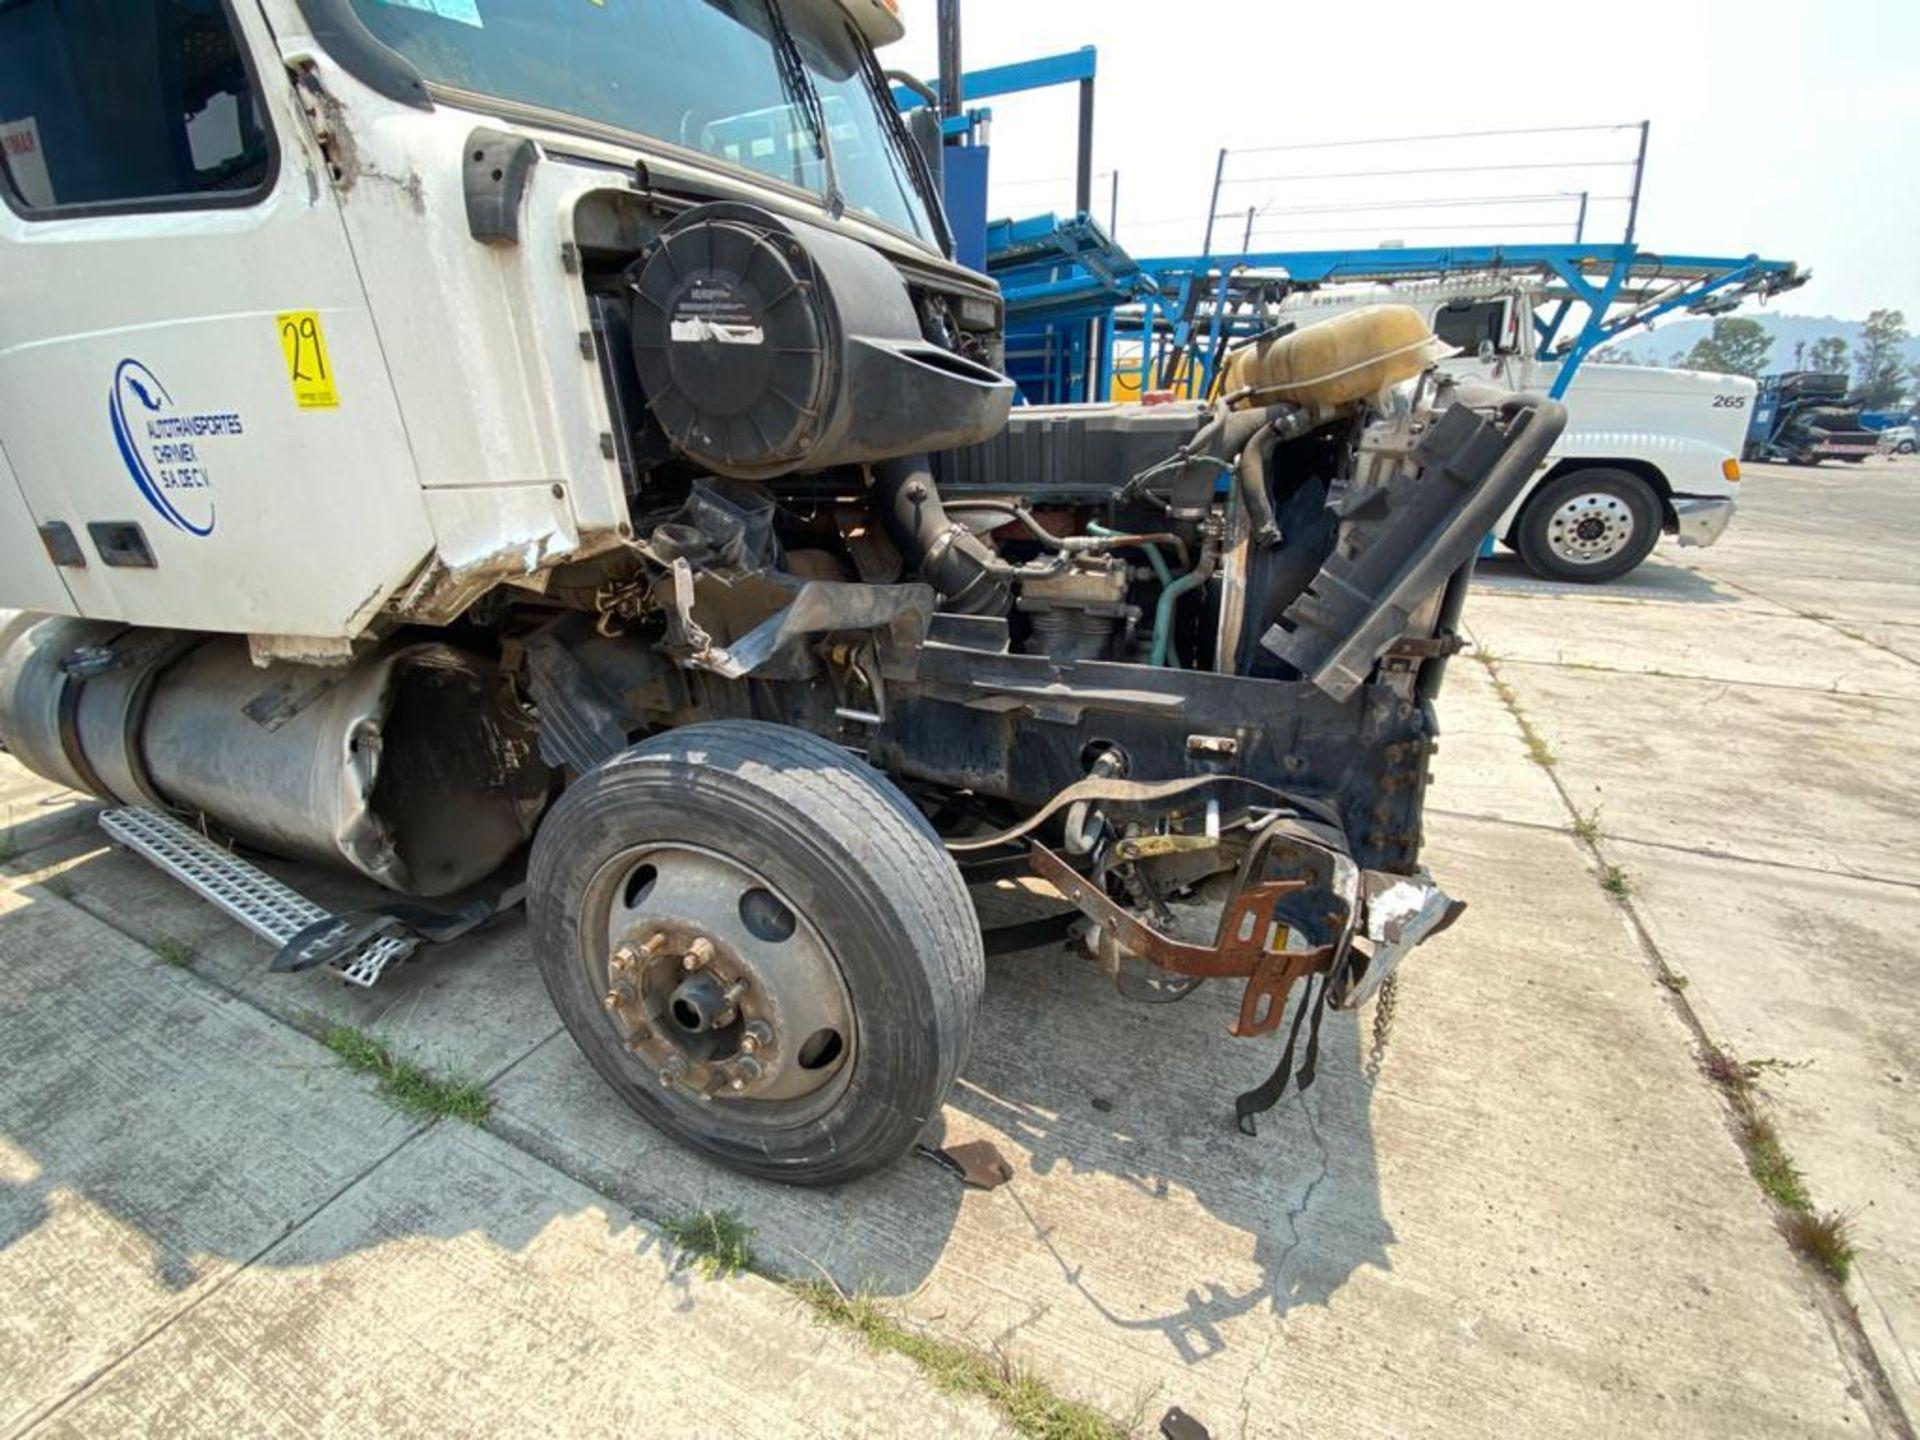 2001 Volvo Sleeper Truck Tractor, estándar transmissión of 18 speeds, with Volvo motor - Image 32 of 60